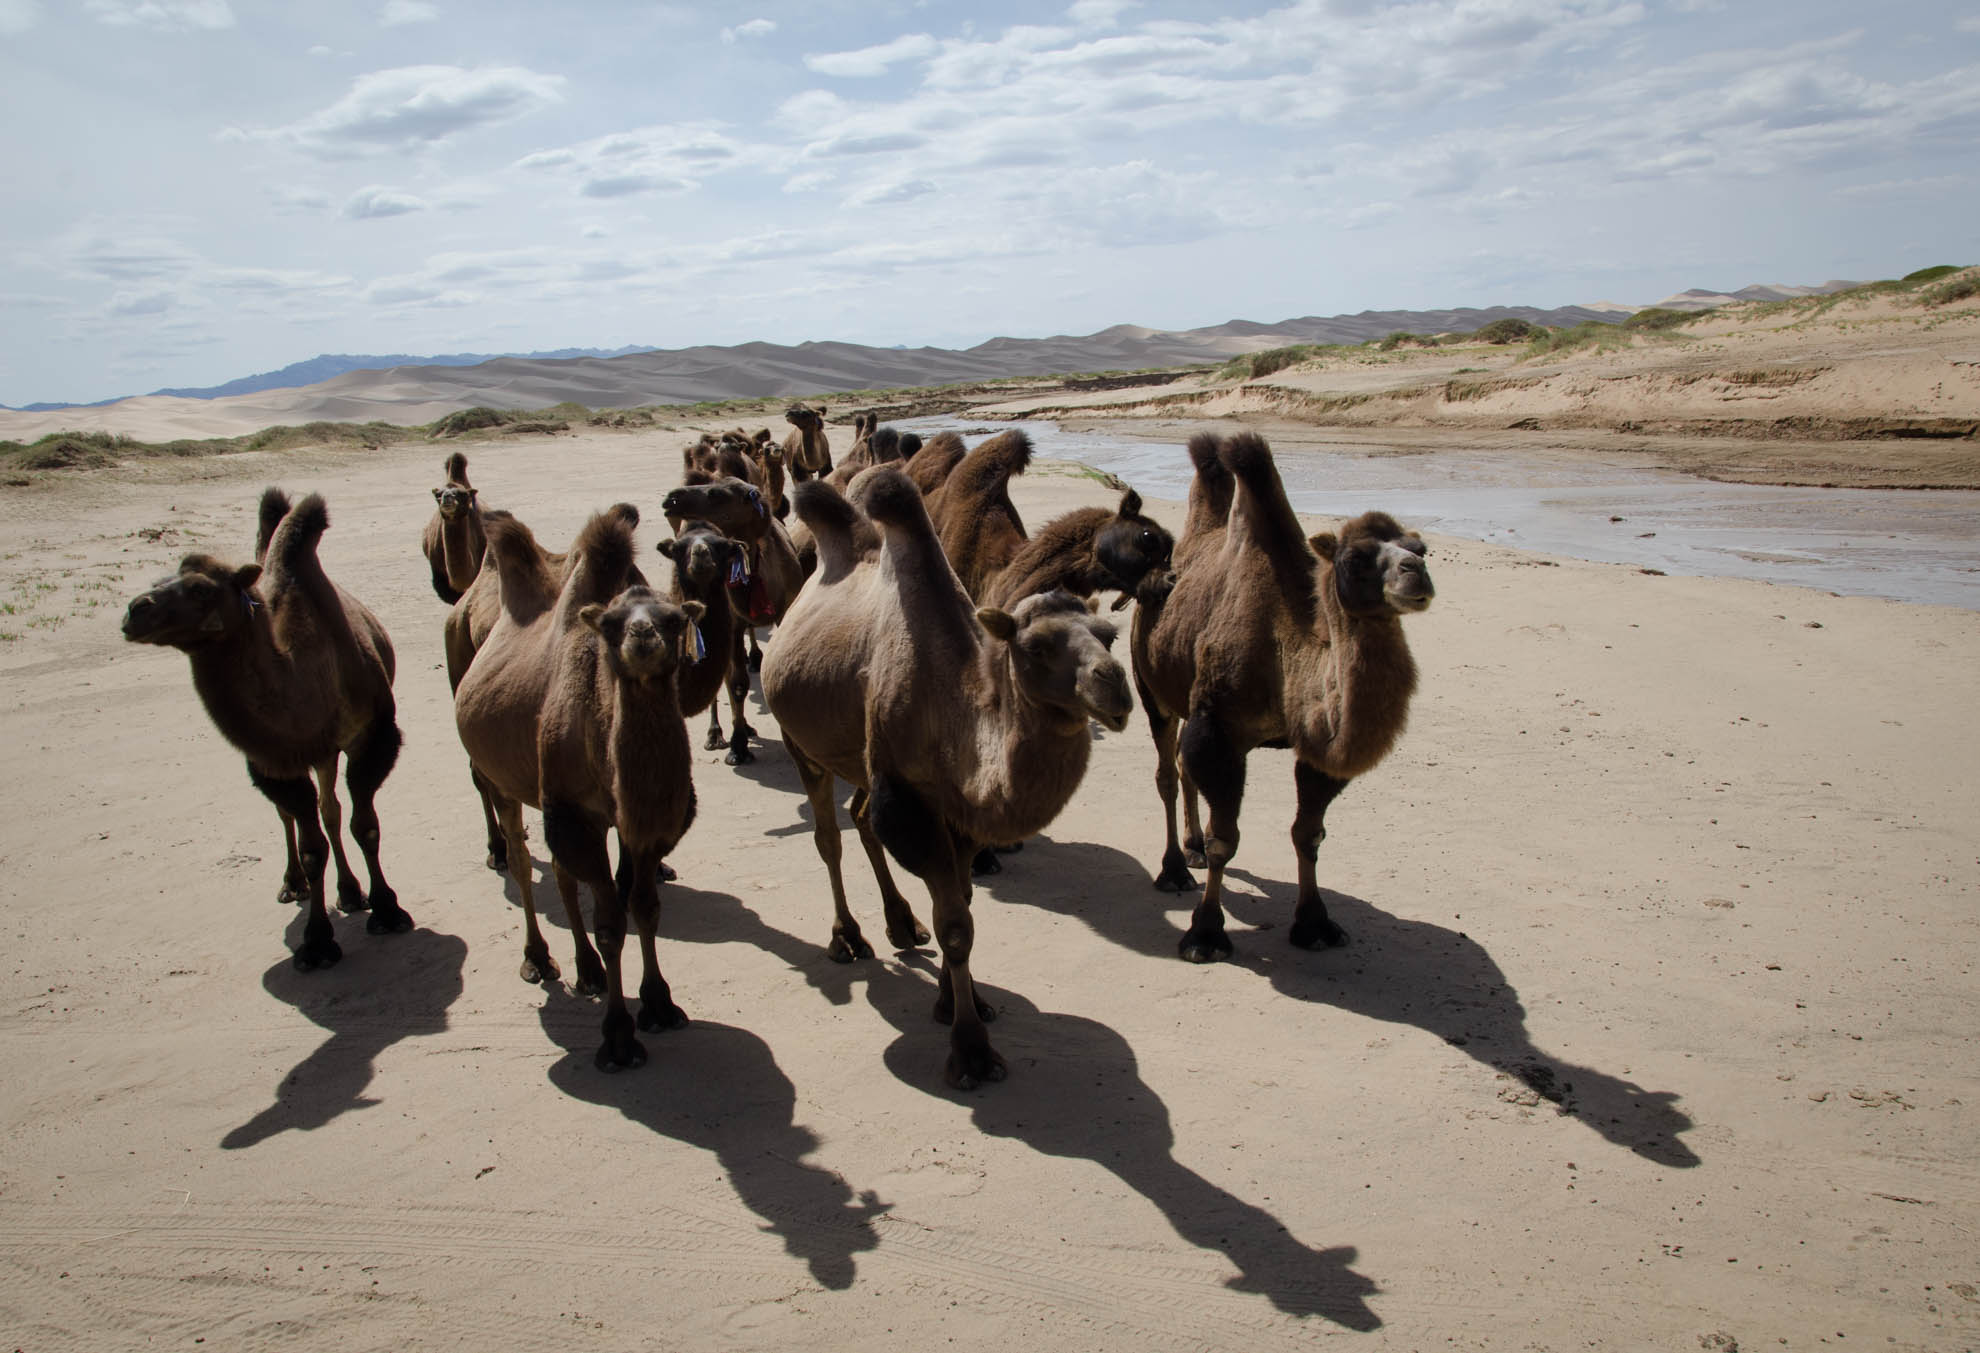 Curious camels